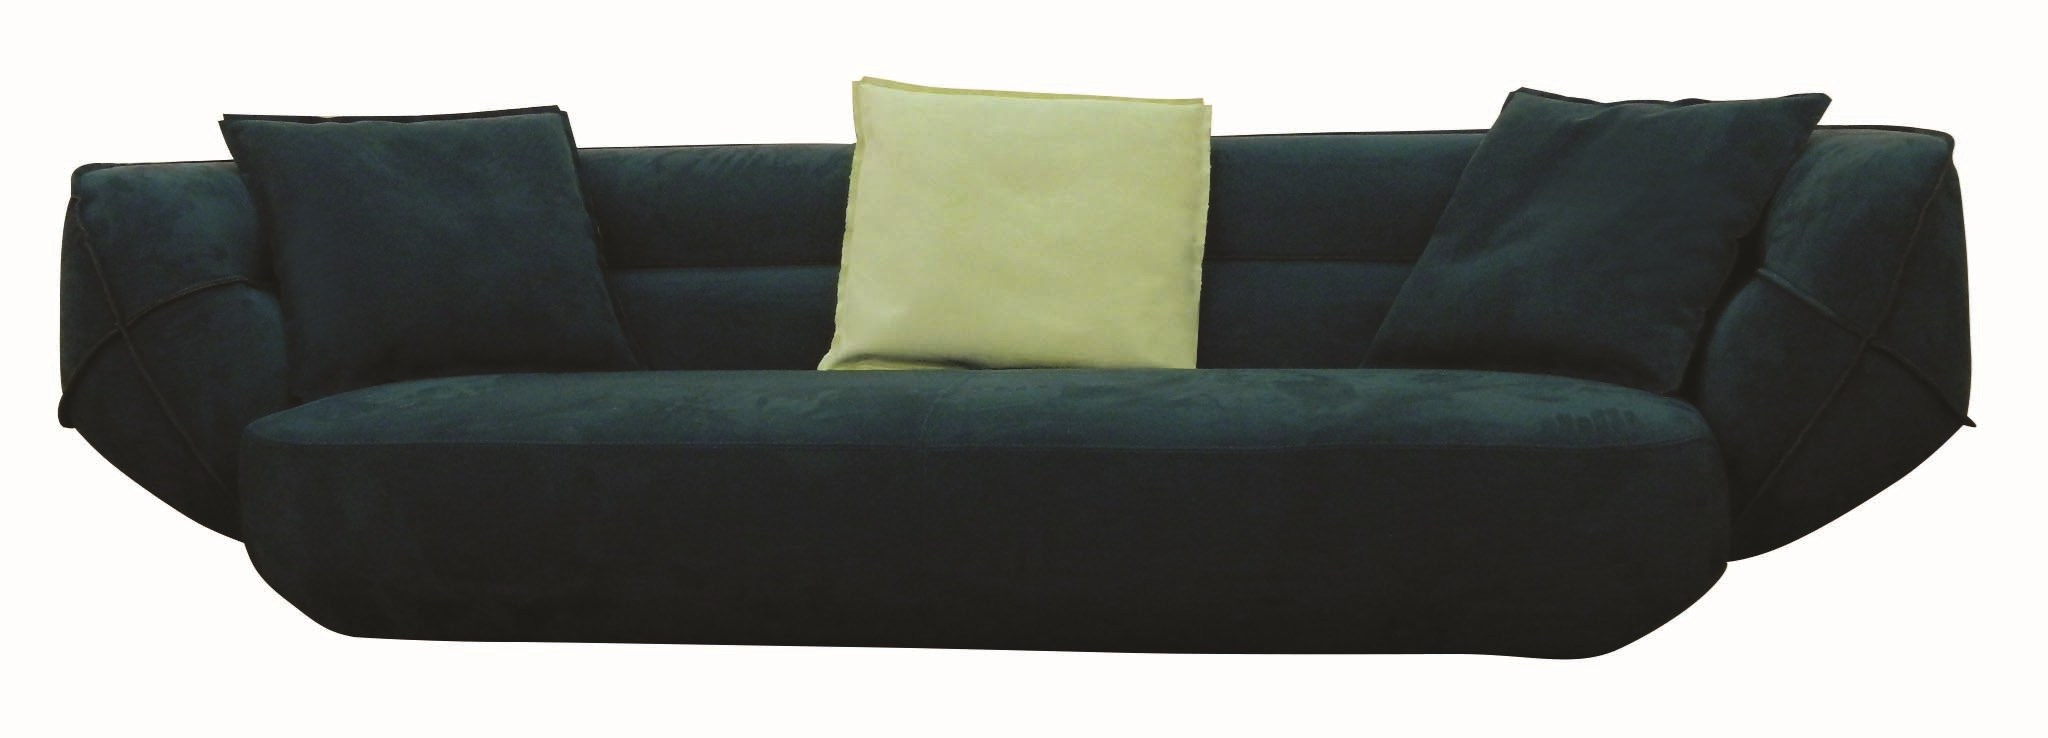 Canap rembourr en tissu ace by roche bobois design christophe delcourt - Canape tissu roche bobois ...